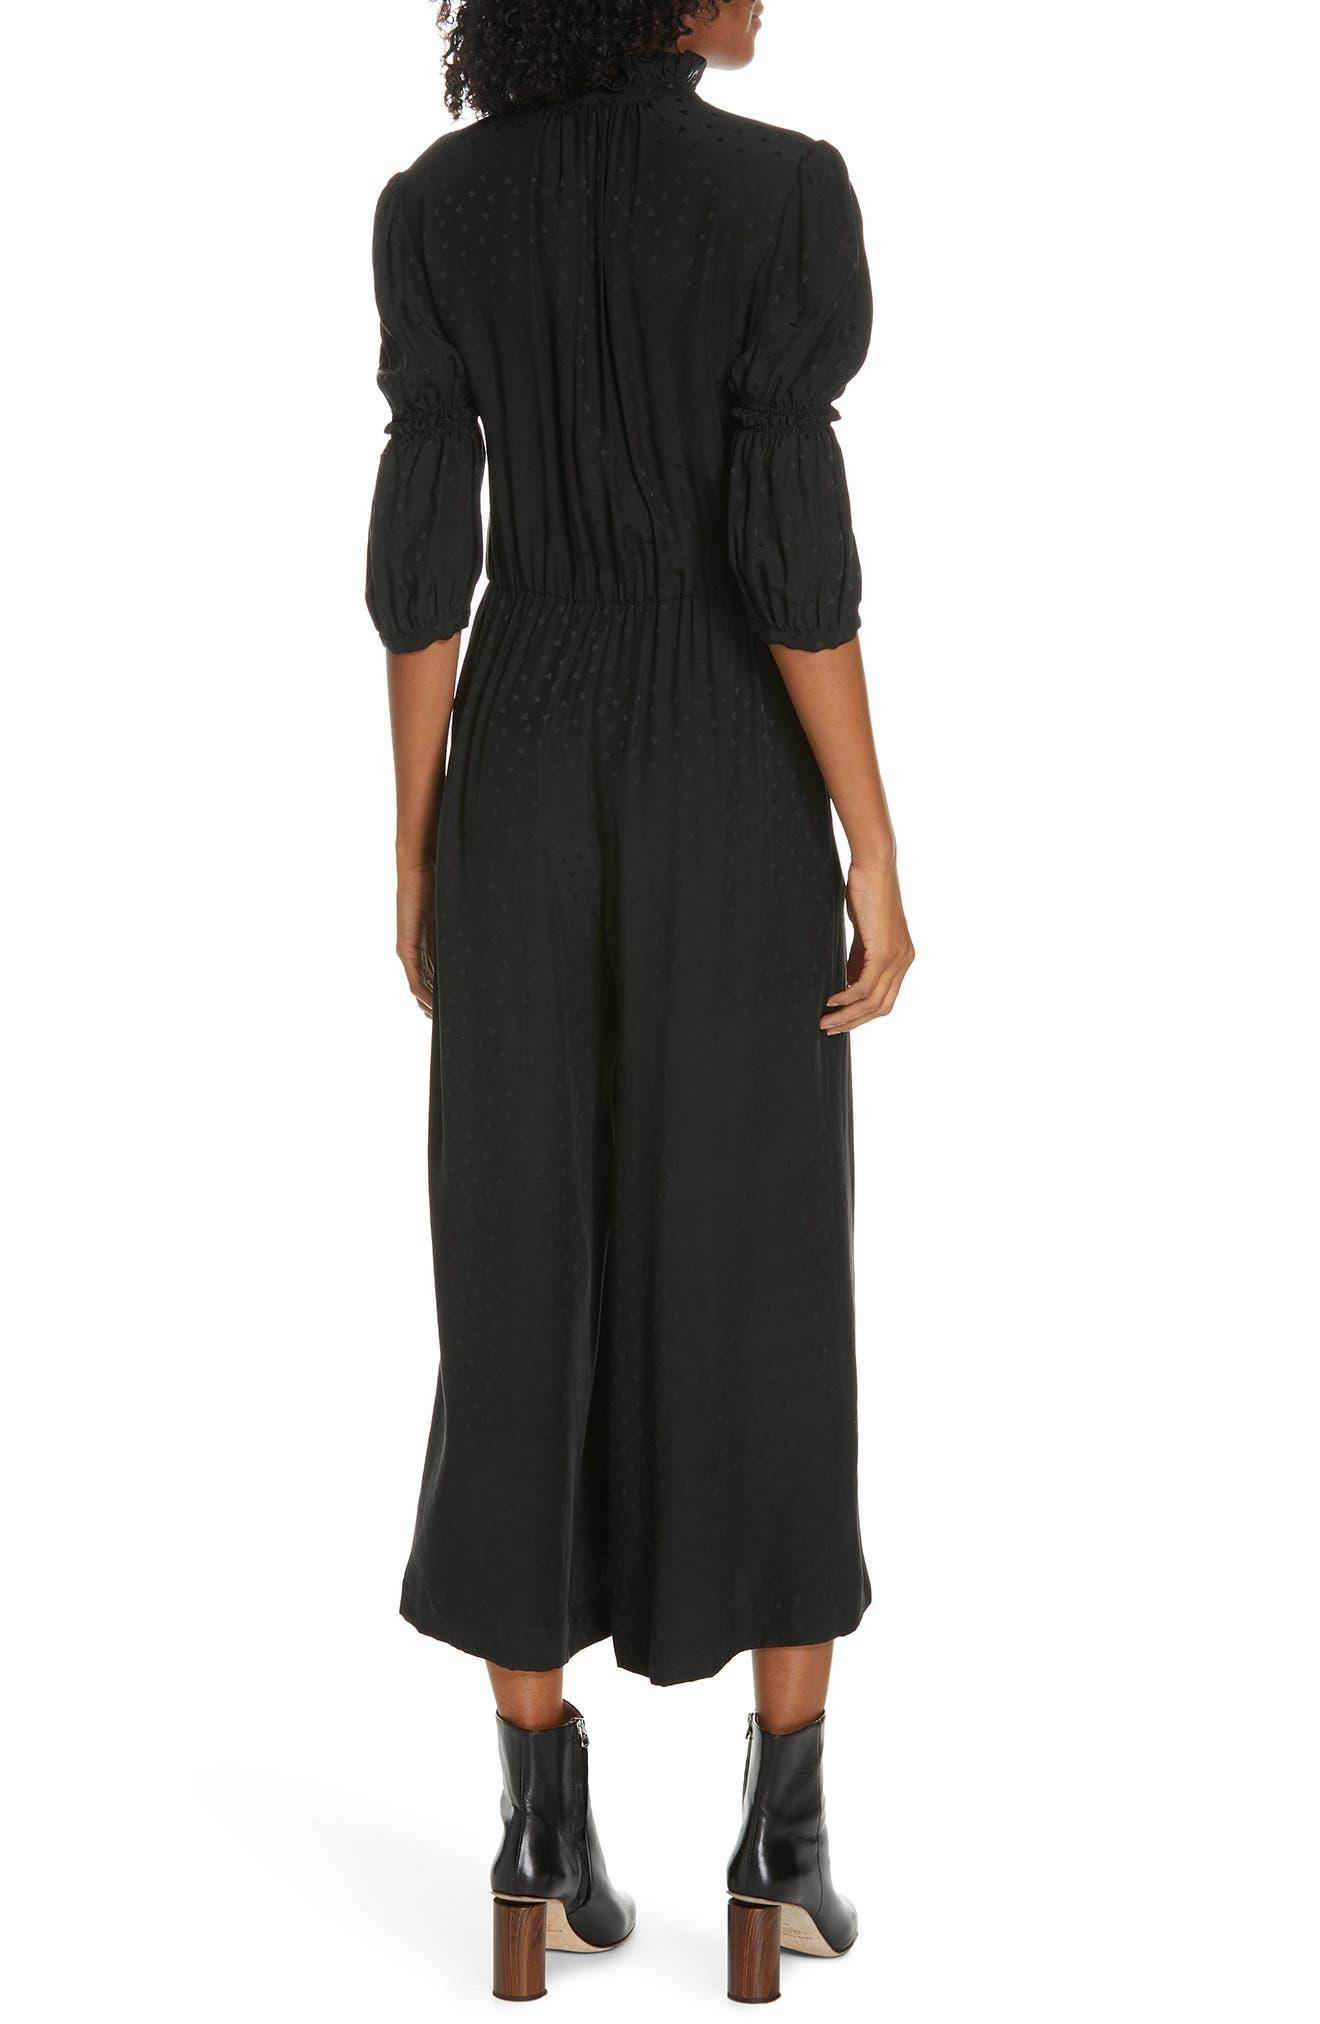 REBECCA TAYLOR,                             Silk Jacquard Jumpsuit,                             Alternate thumbnail 2, color,                             BLACK